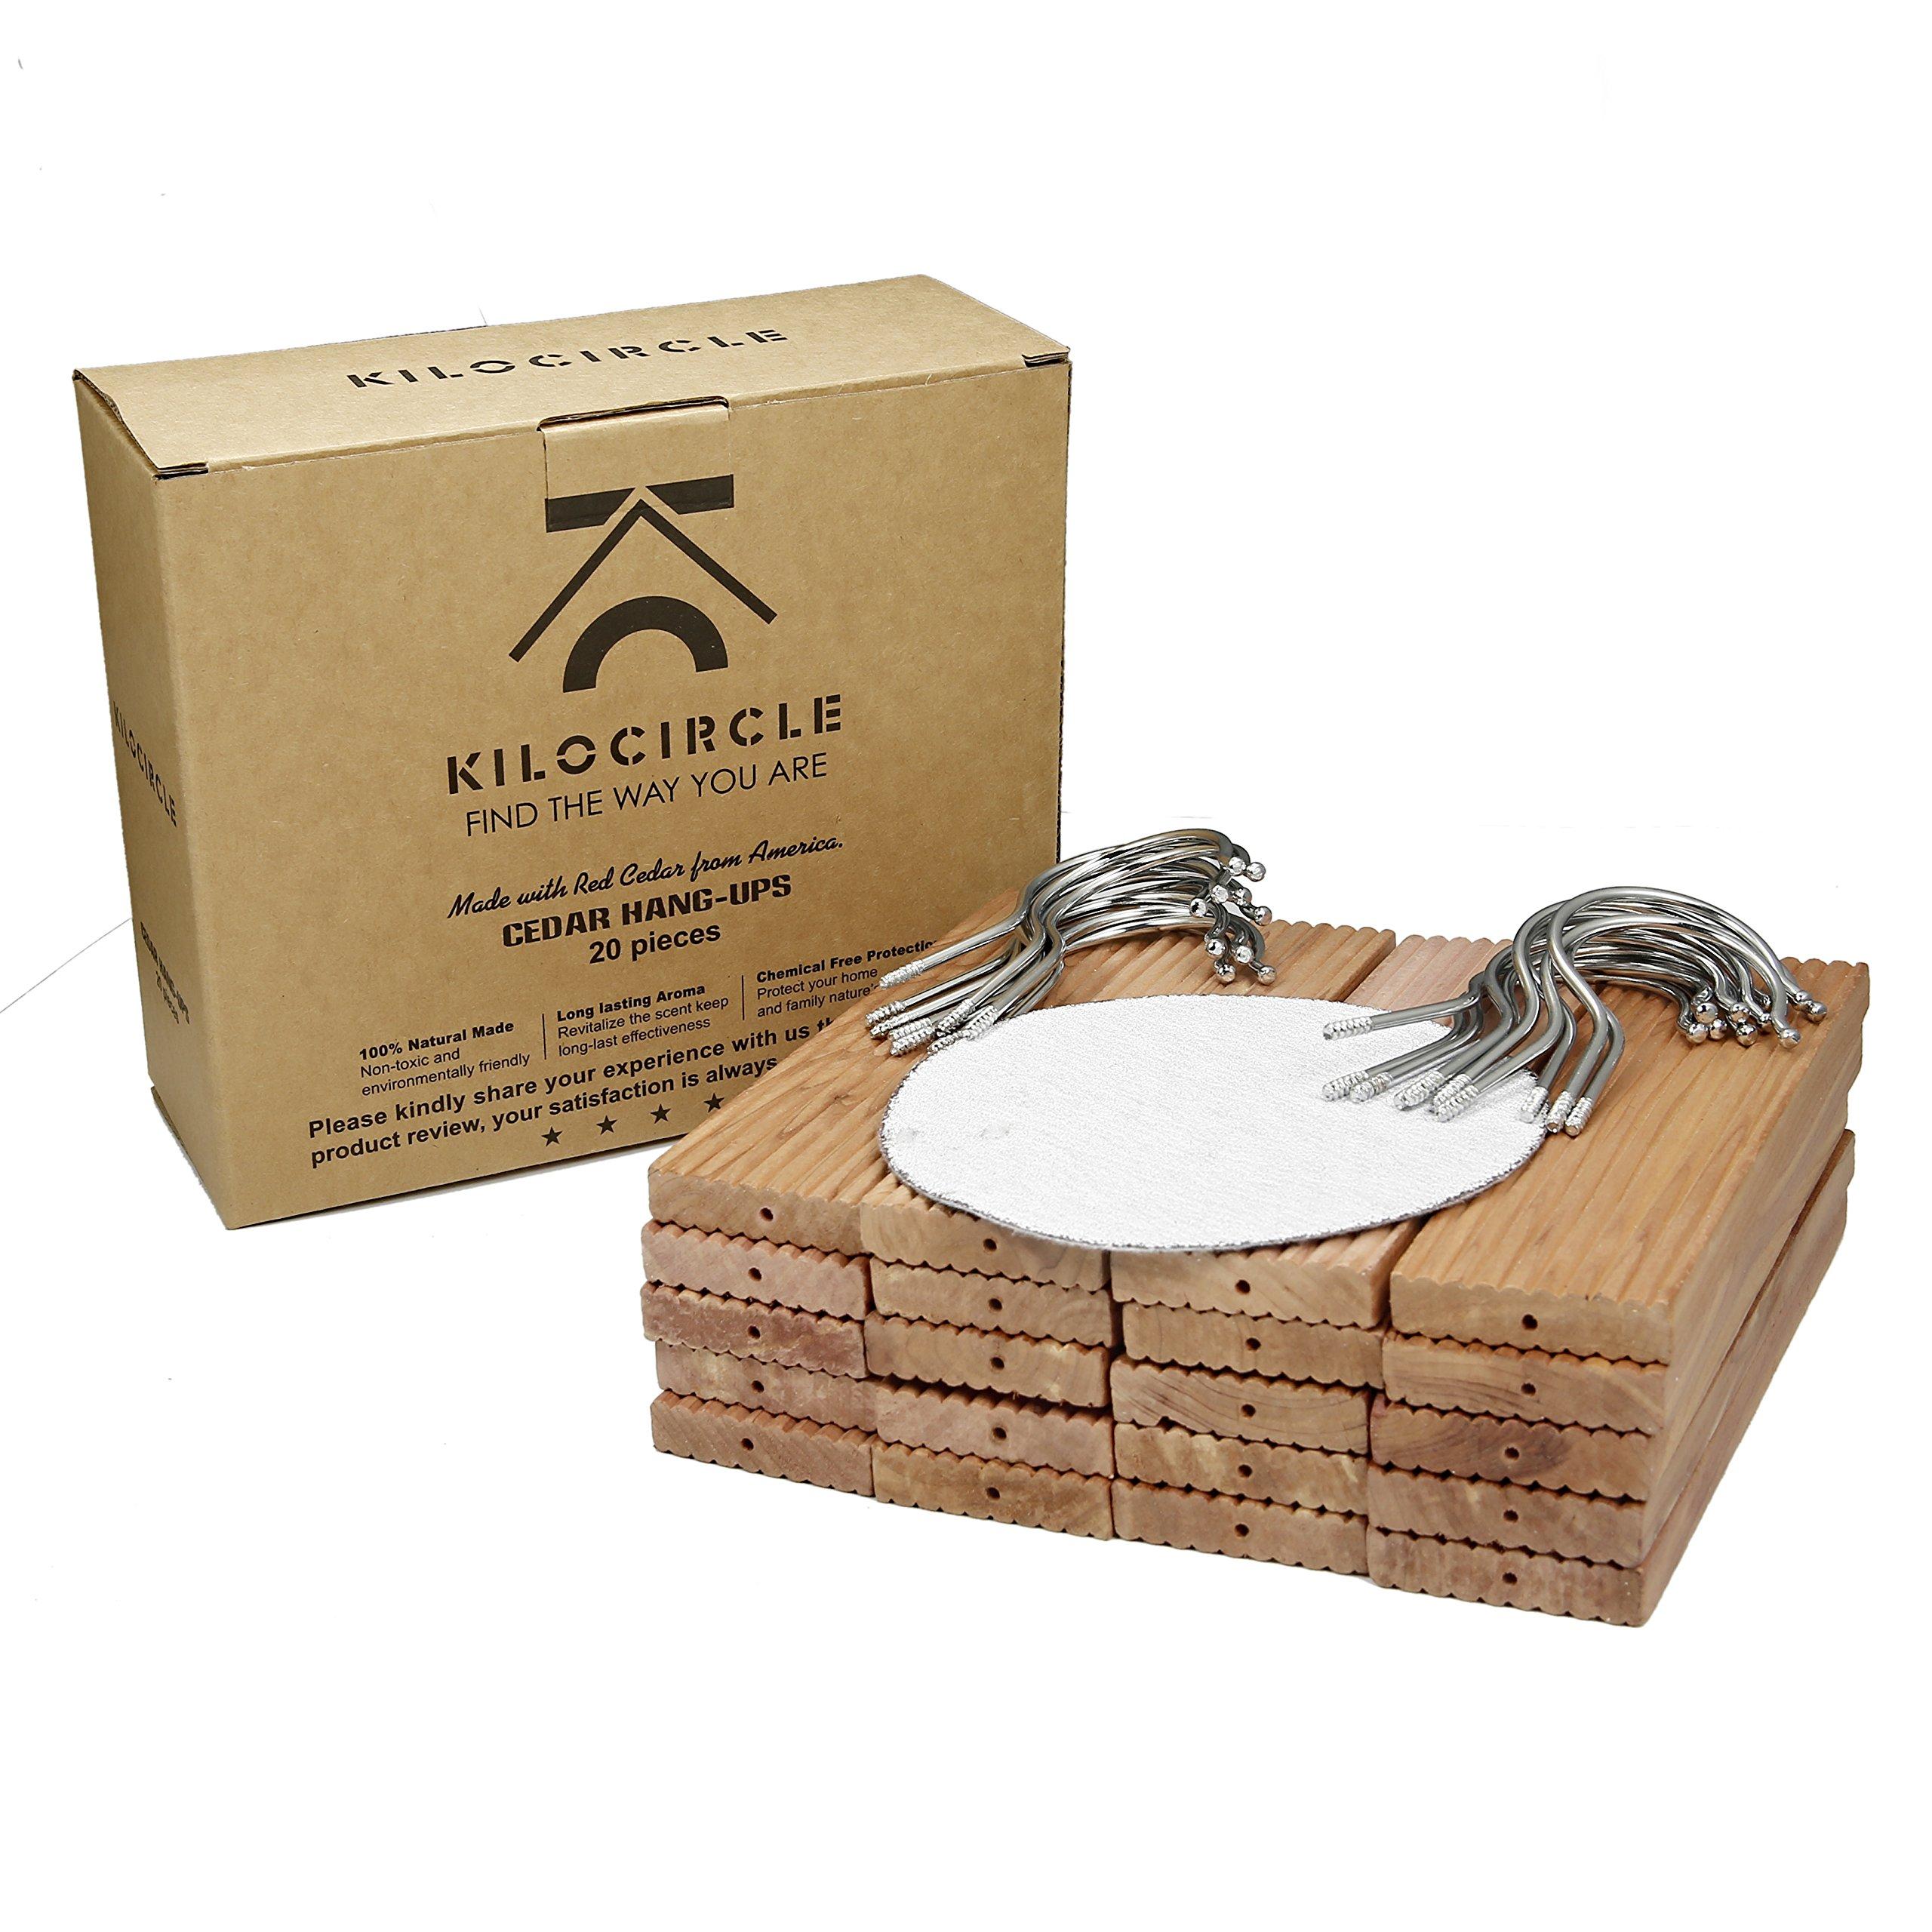 Kilocircle 20 pack cedar hang ups-nature moth repellent for closet with cedar fragrance-standard size 6.5''x1.9''X0.5''